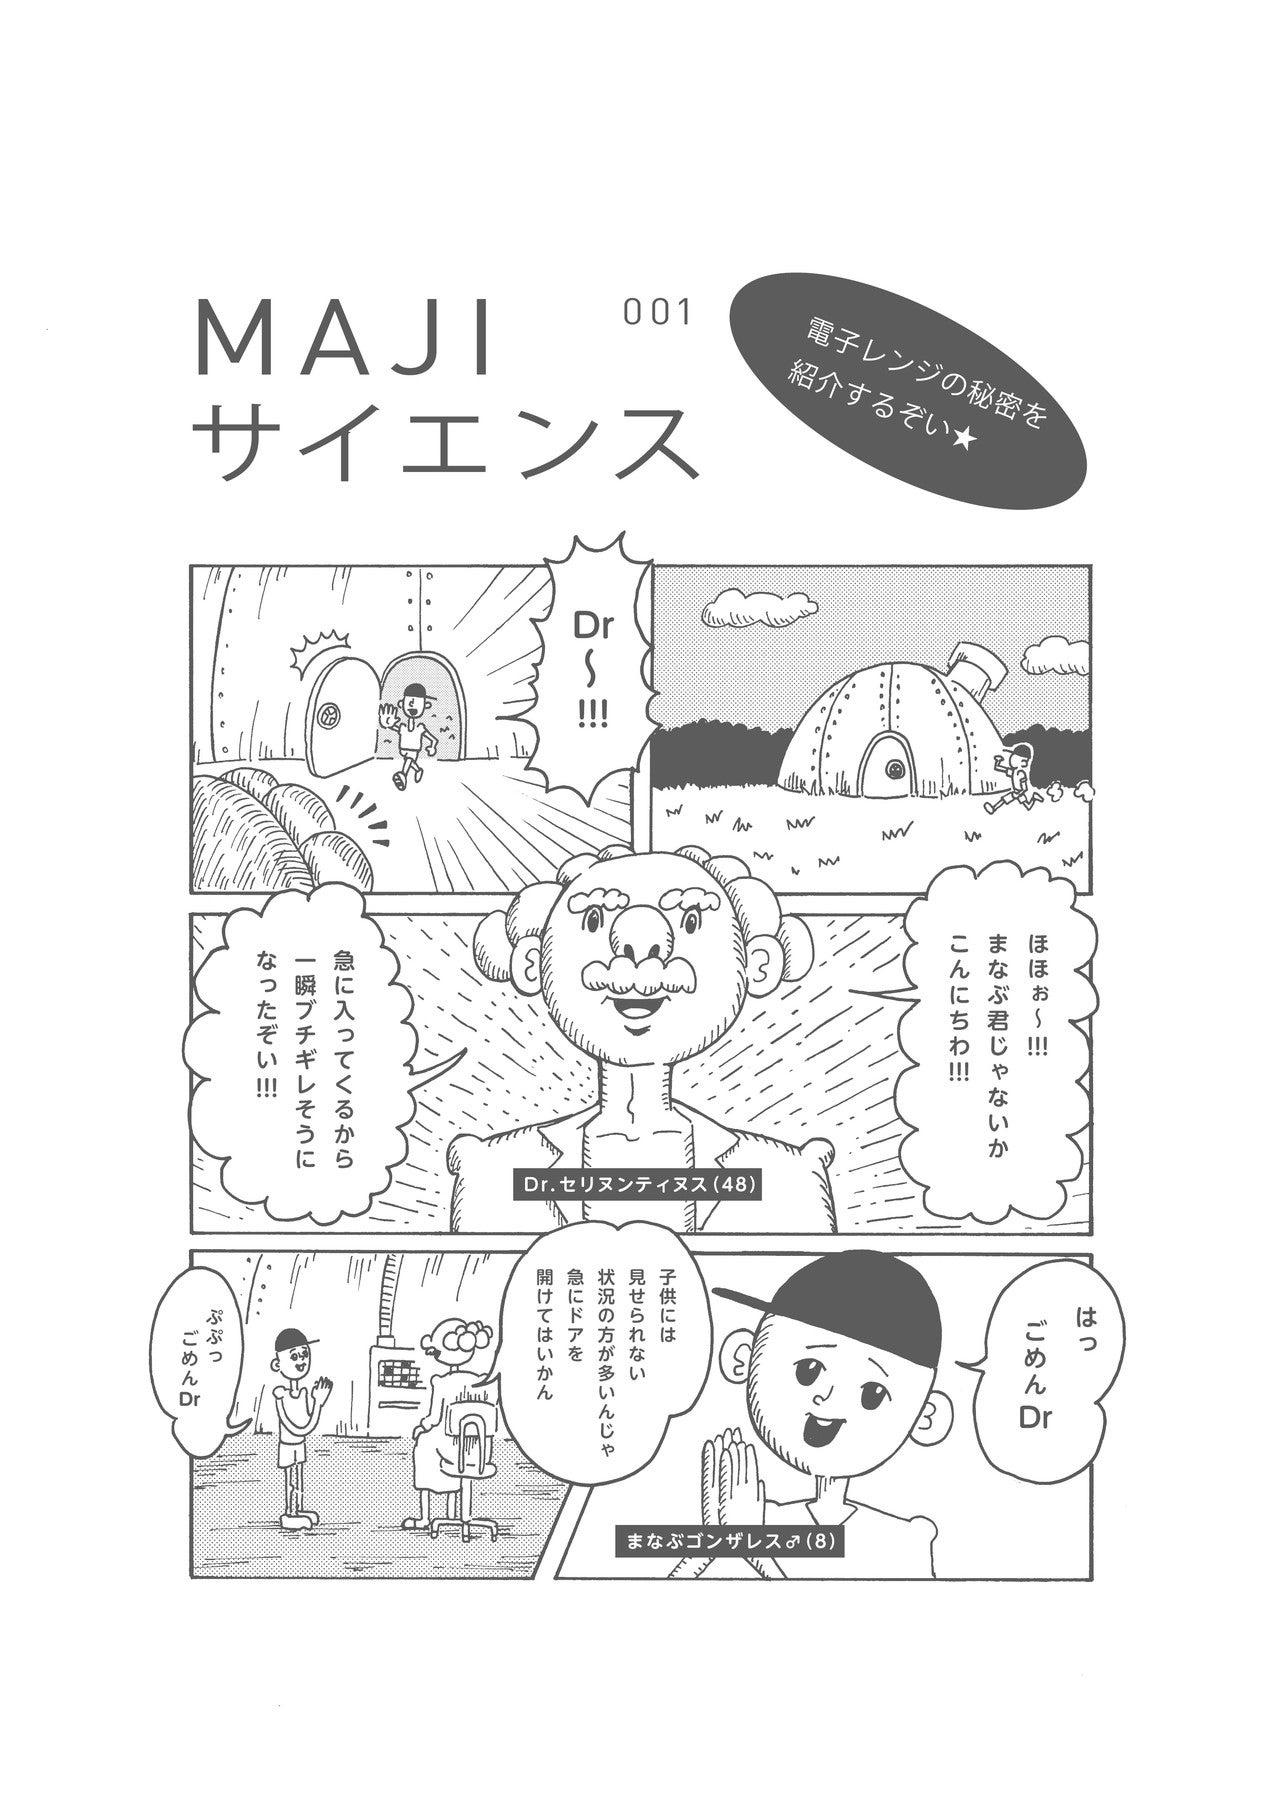 MAJIサイエンス_まとめ+-01